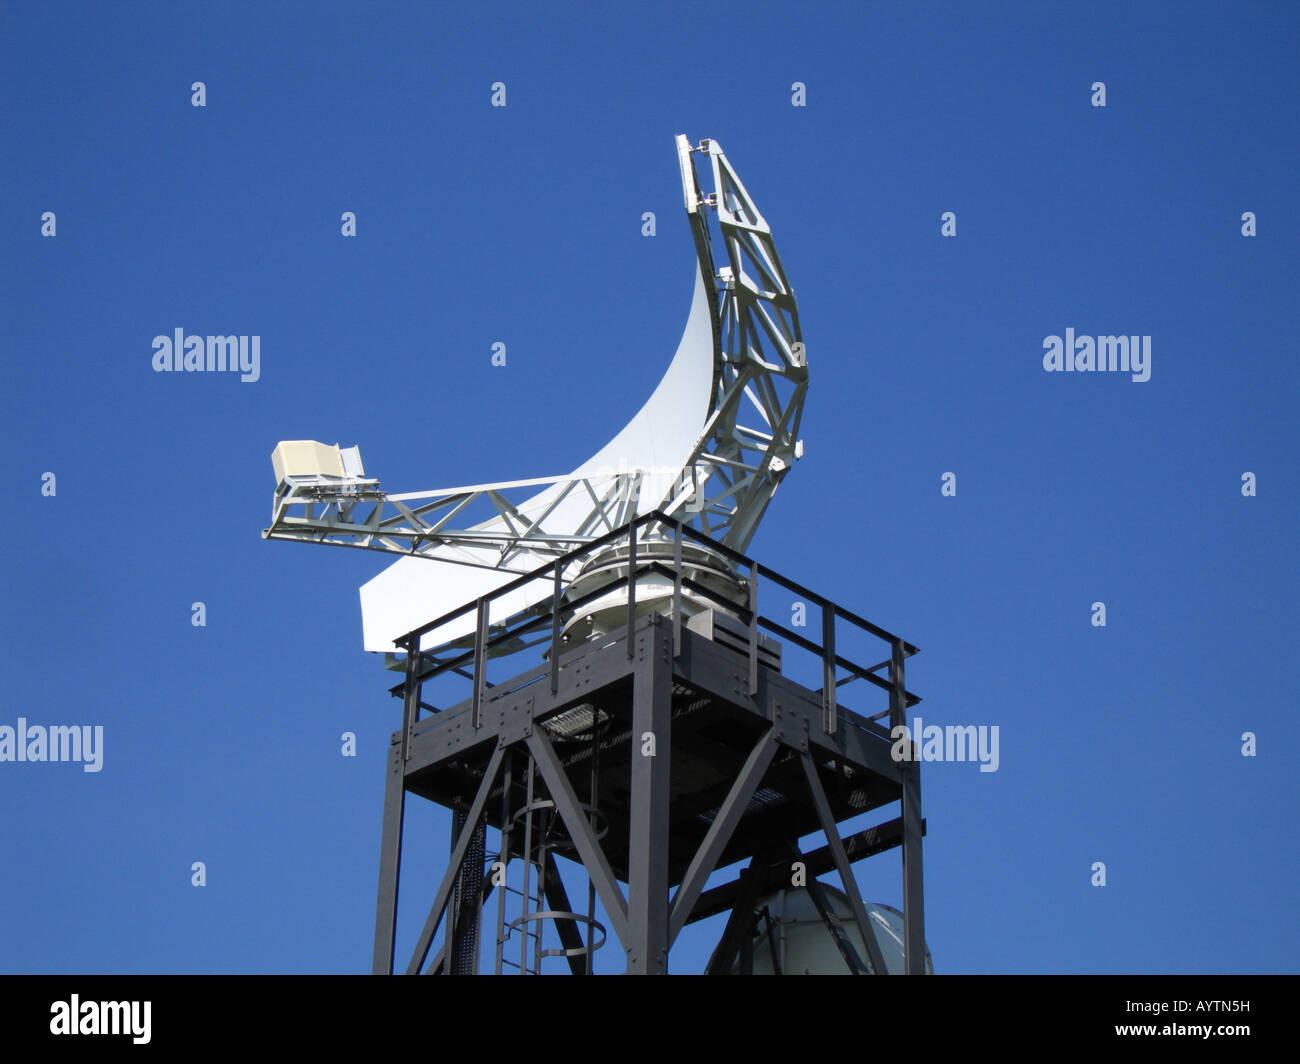 Radar tower and dish Coastguard Station Fairlight Hastings Sussex England UK - Stock Image